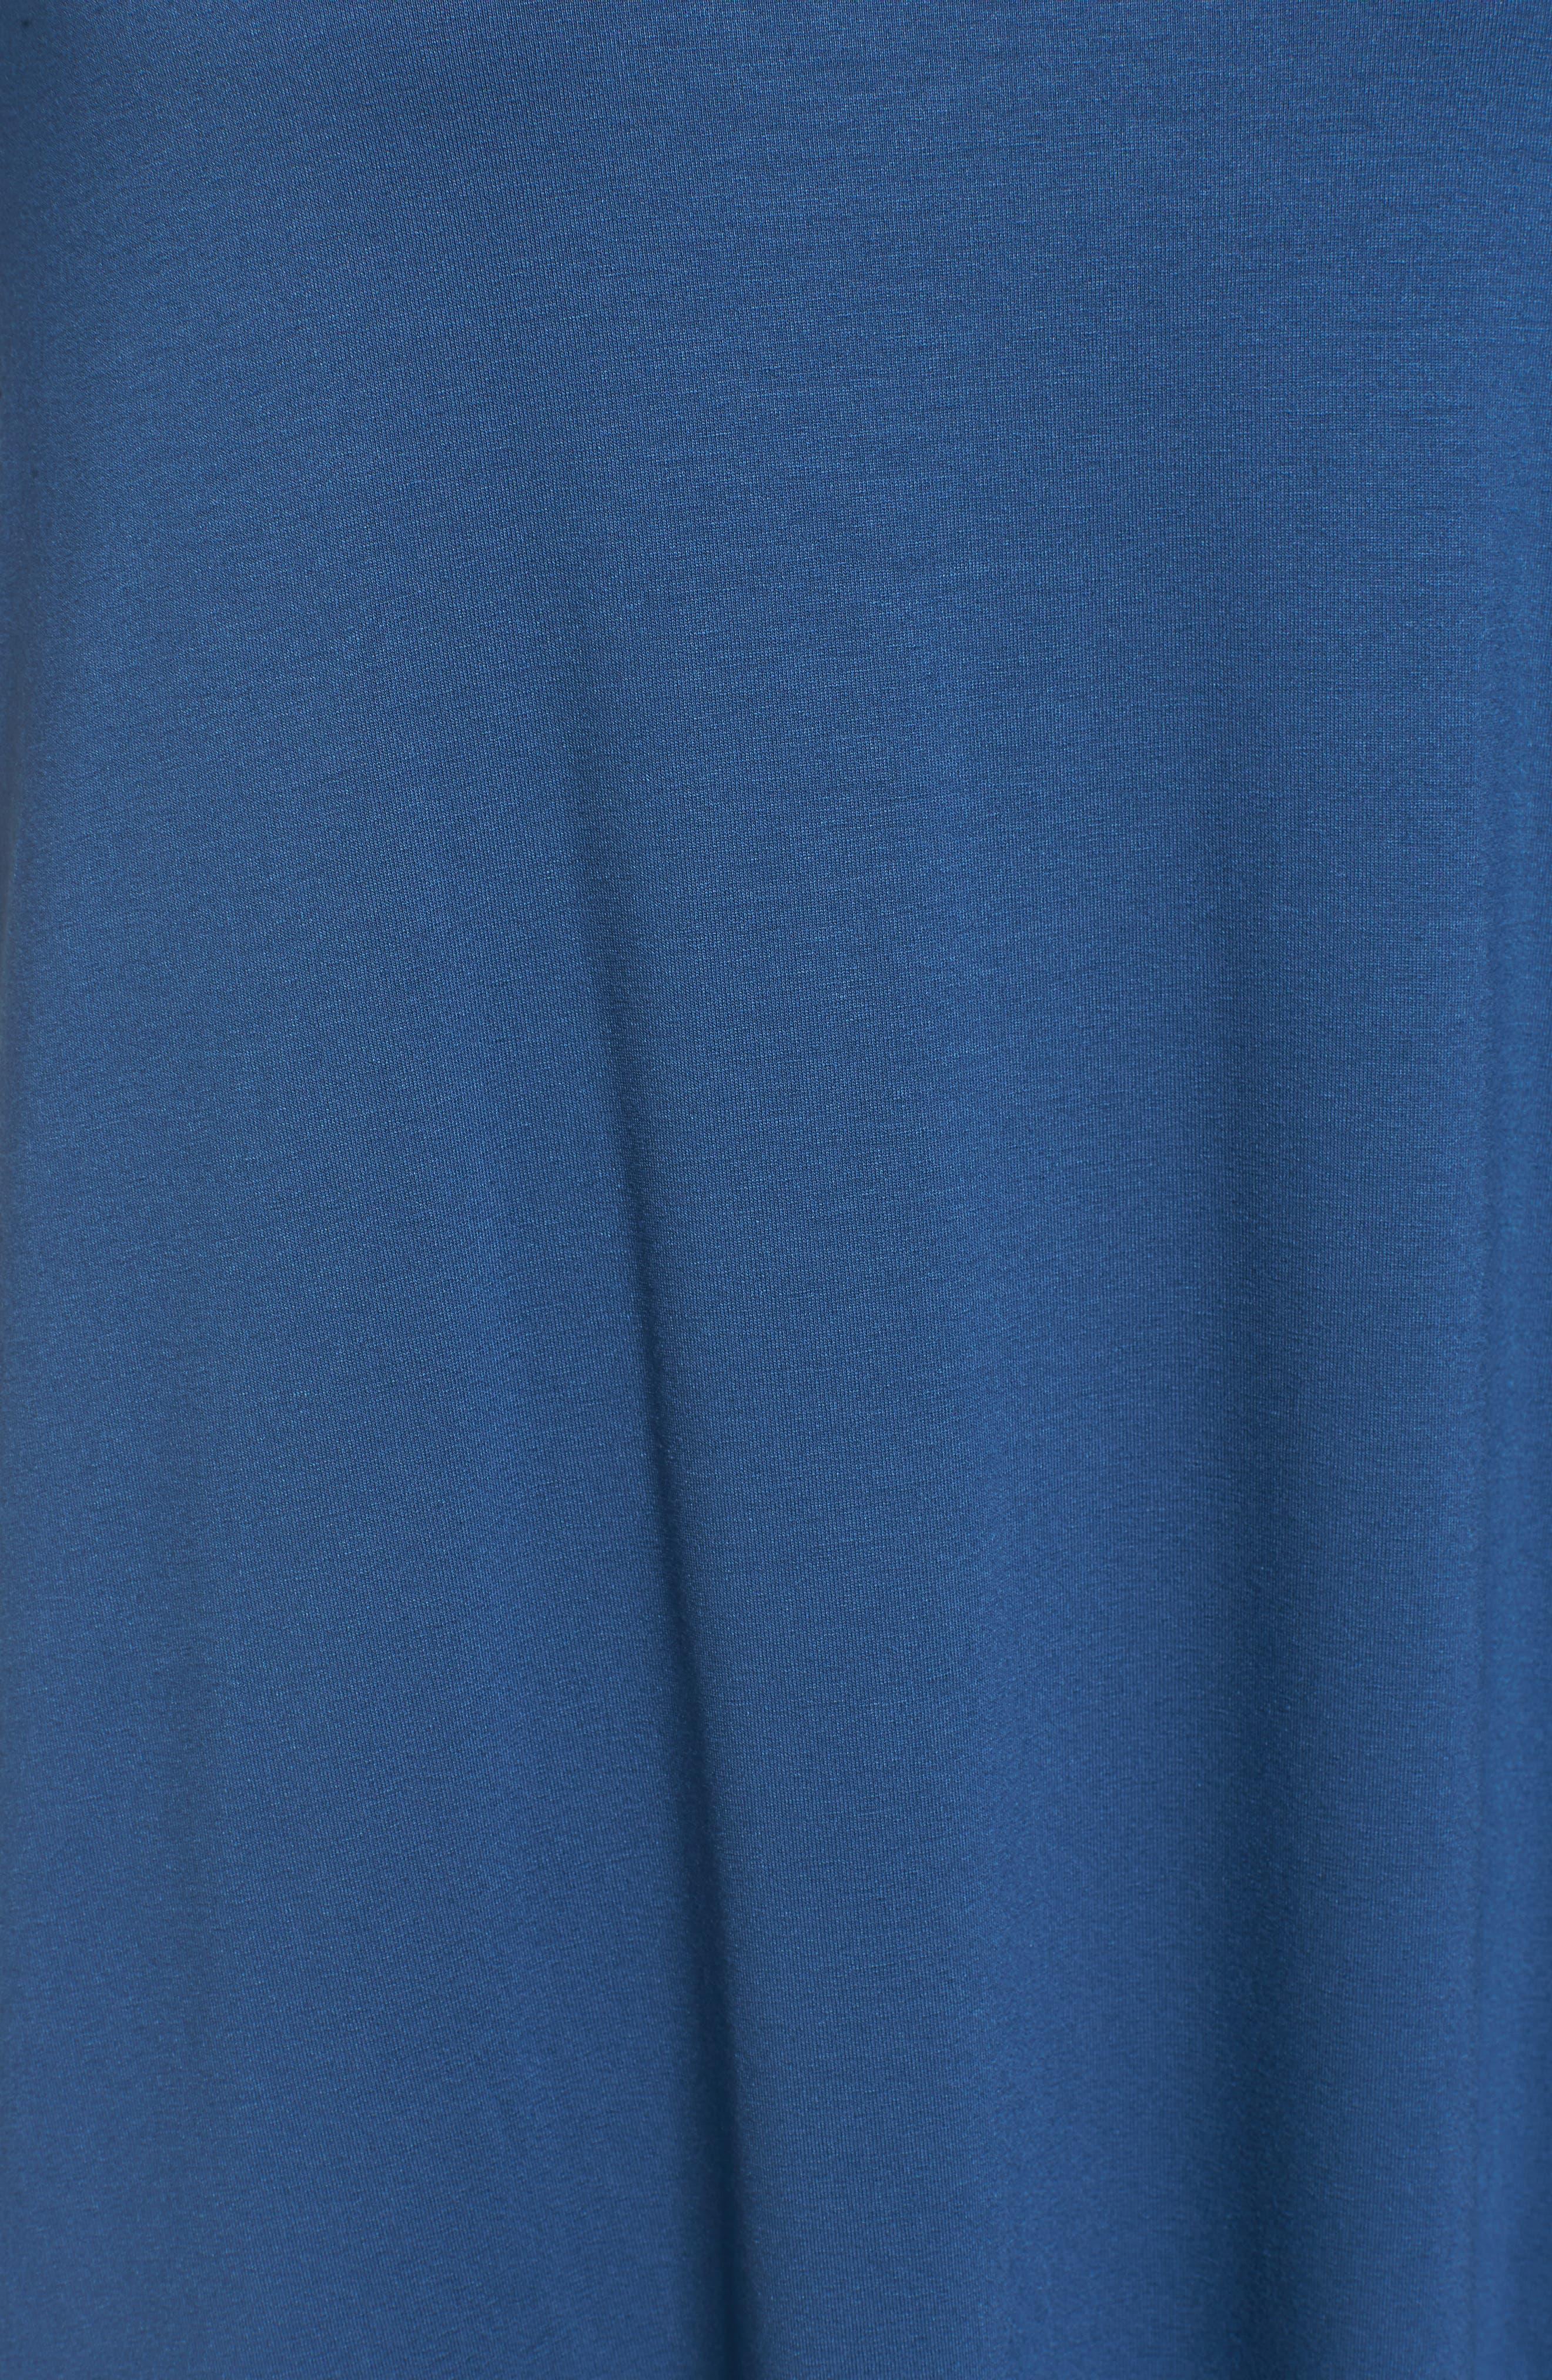 Jersey Asymmetrical A-Line Dress,                             Alternate thumbnail 24, color,